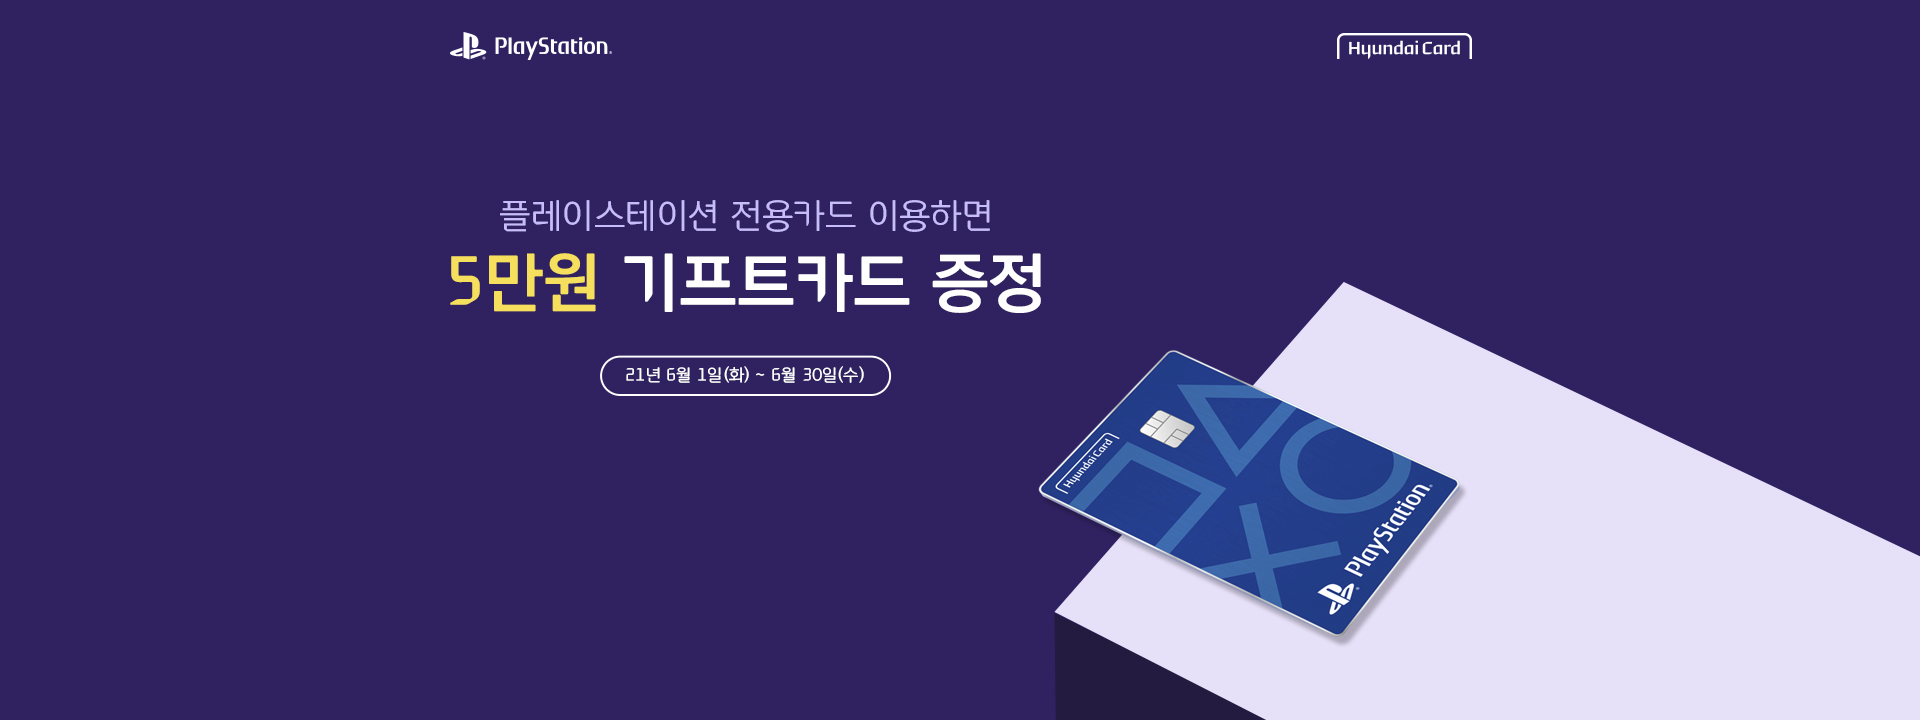 Hyundai Card